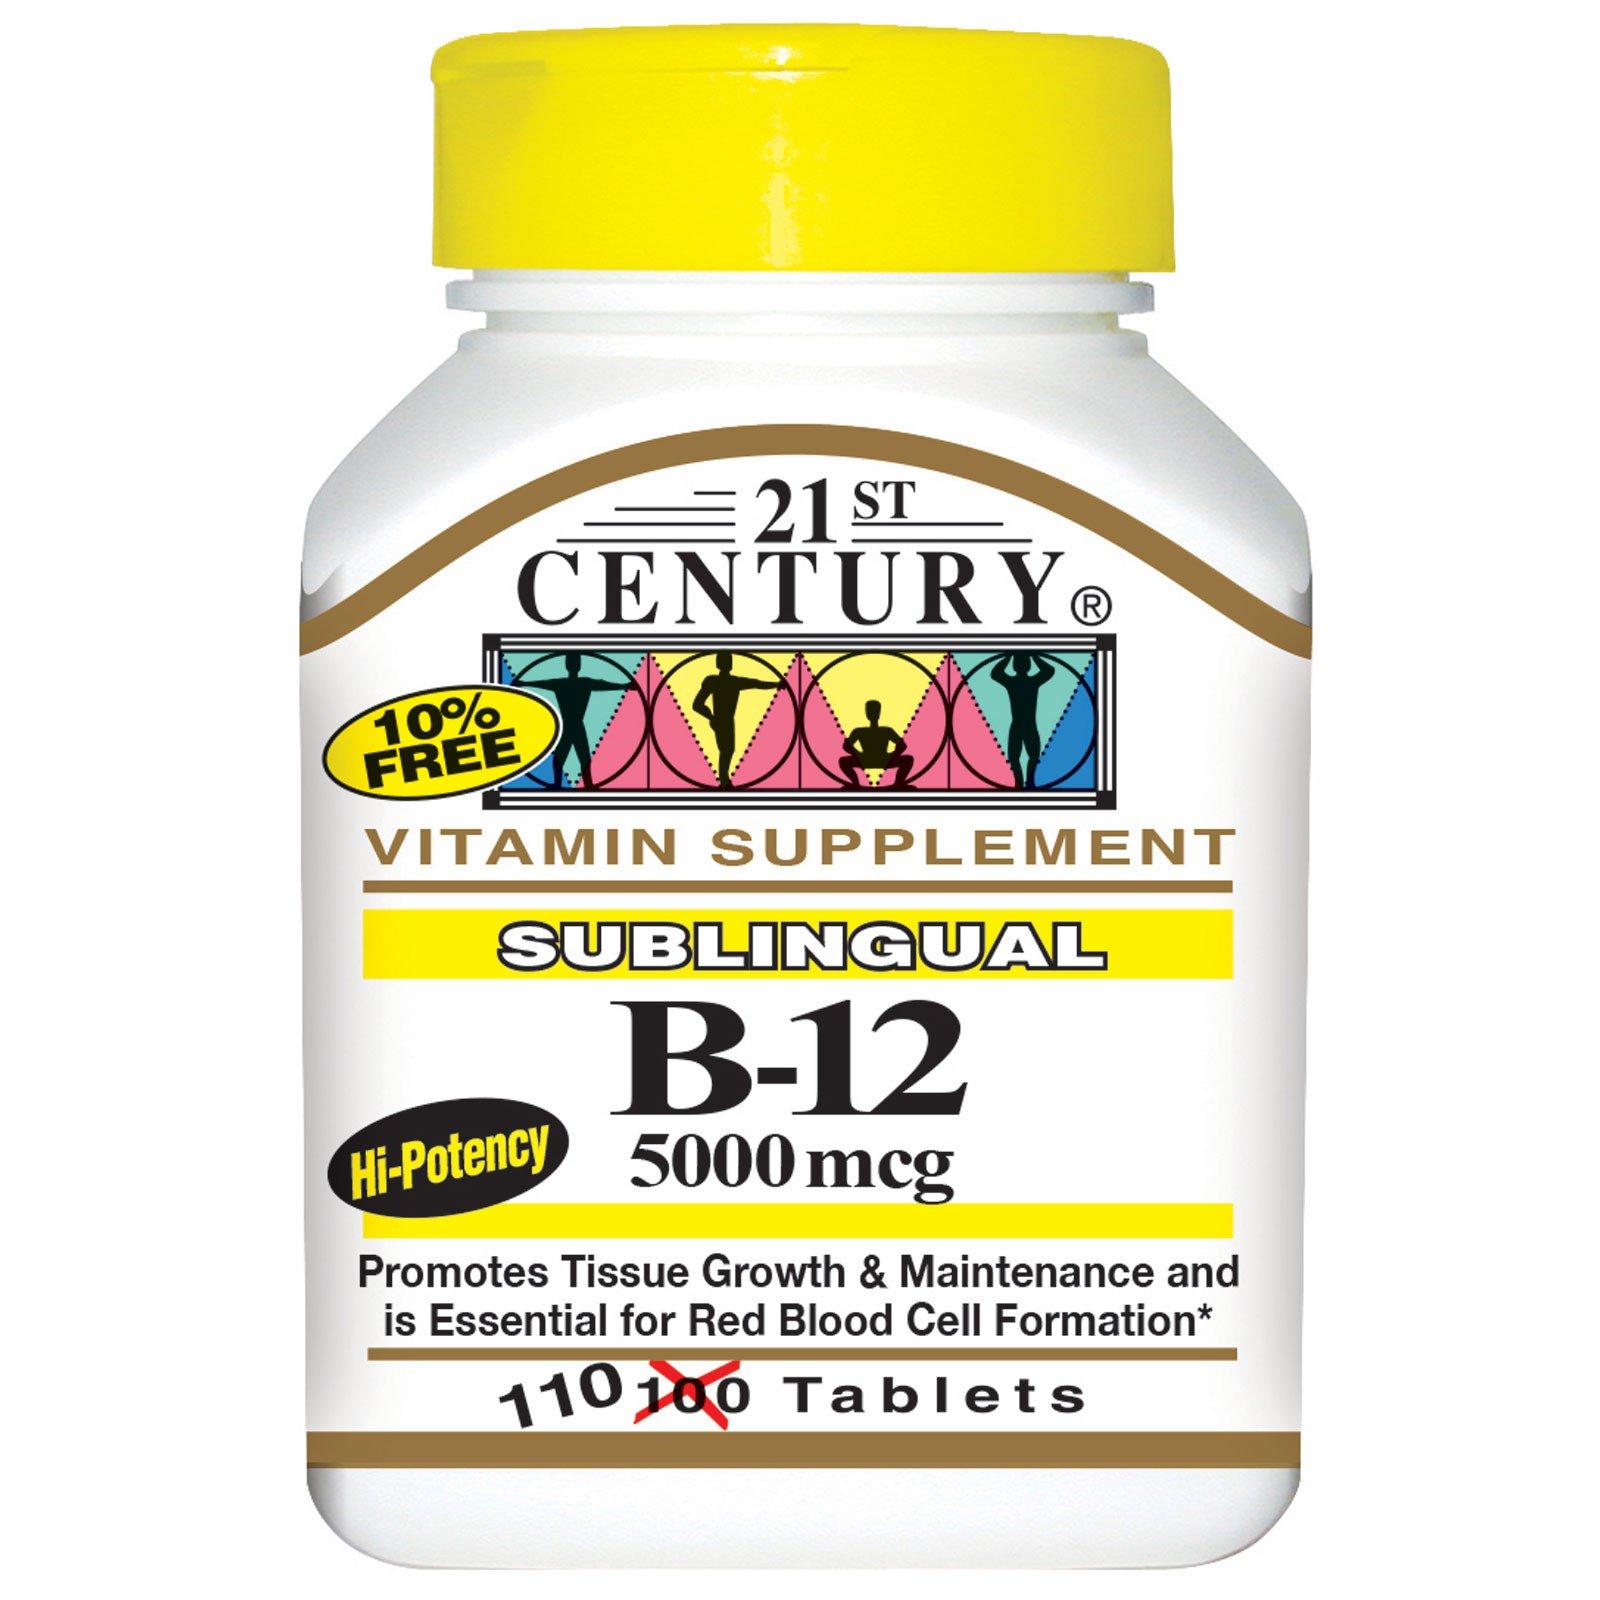 21st Century, Сублингвальный витамин B12, 5000 мкг, 110 таблеток